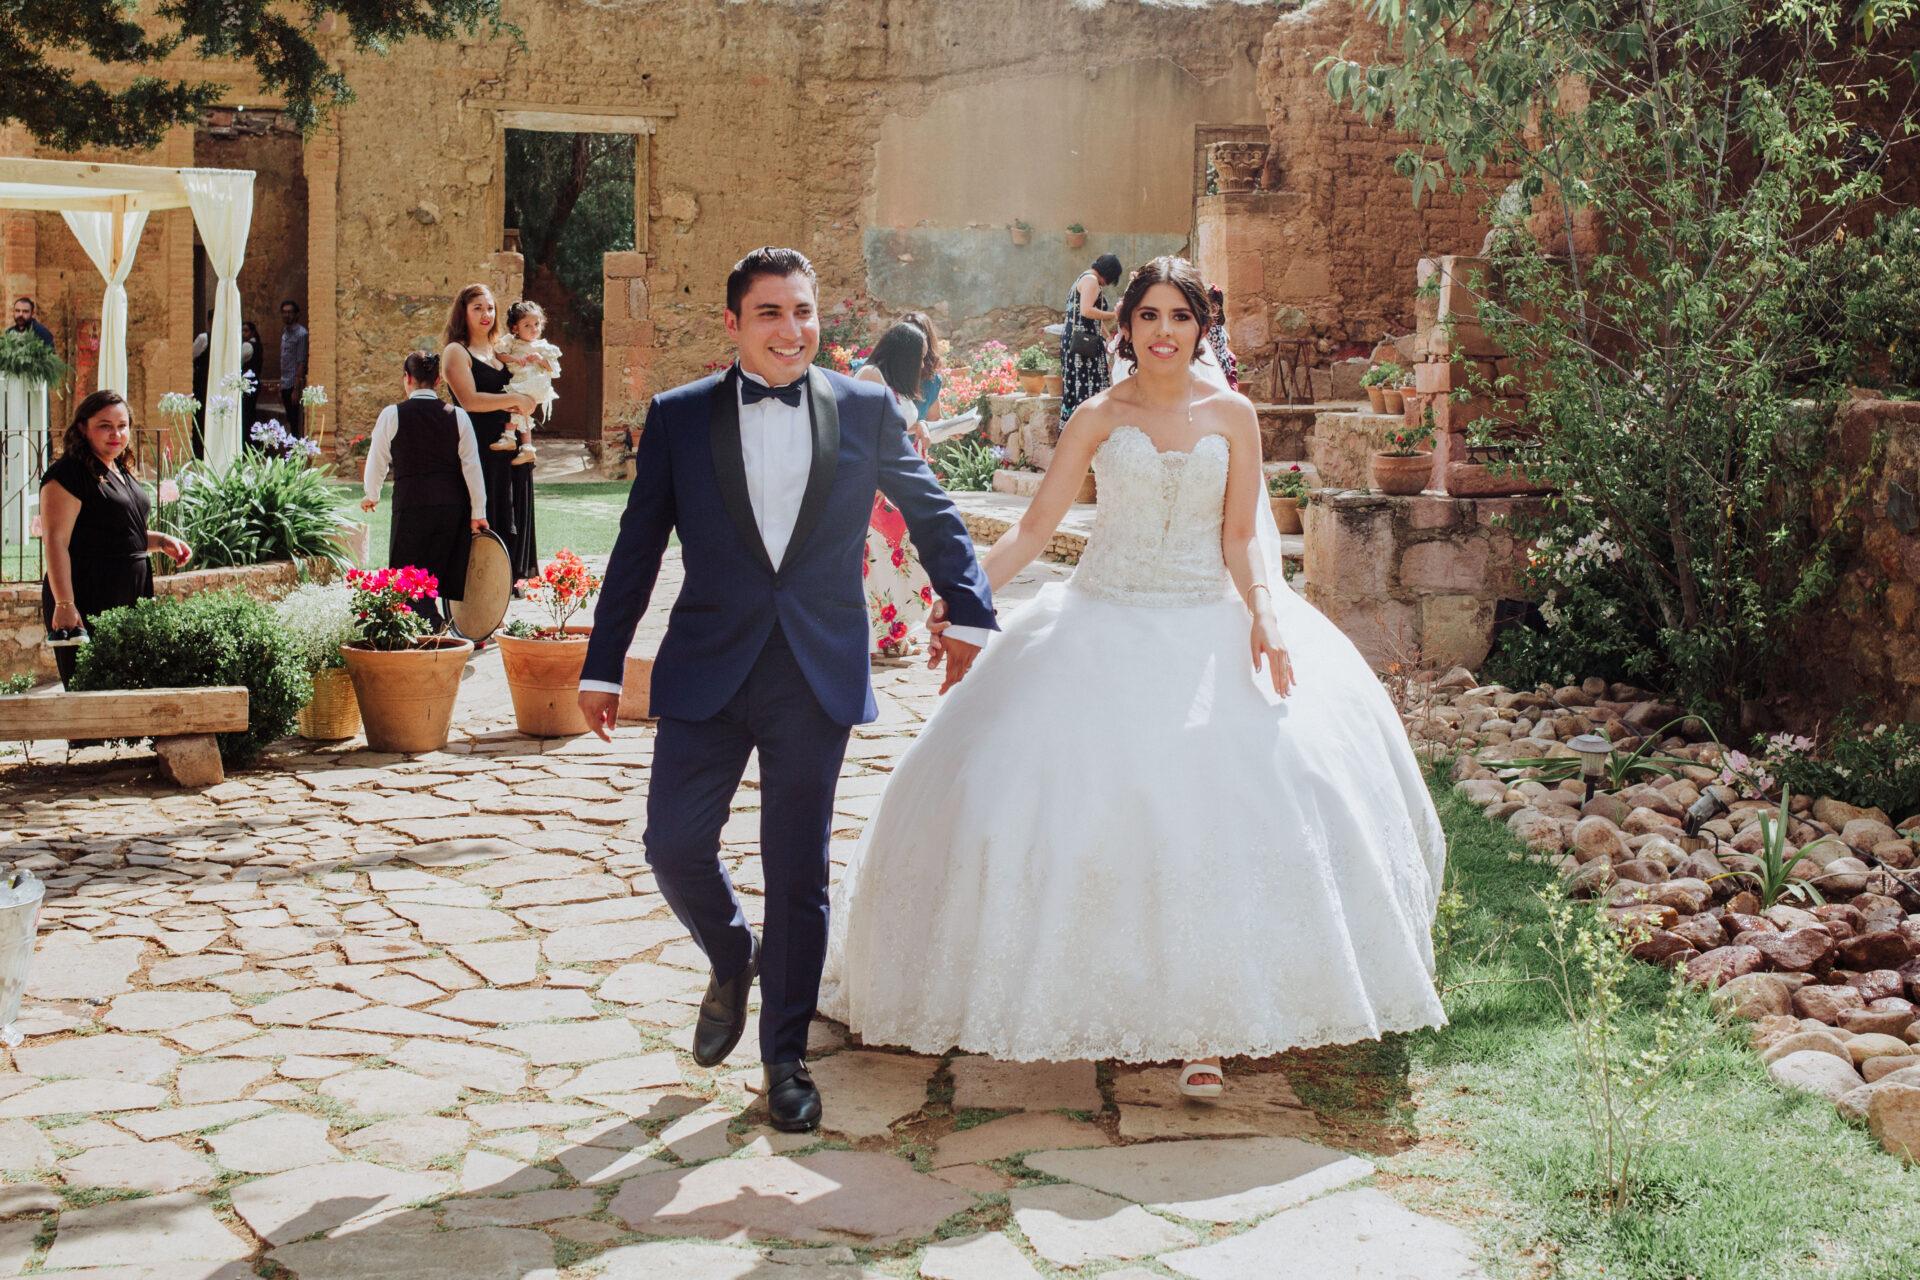 javier_noriega_fotografo_bodas_exhacienda_las_mercedes_zacatecas_wedding_photographer11a